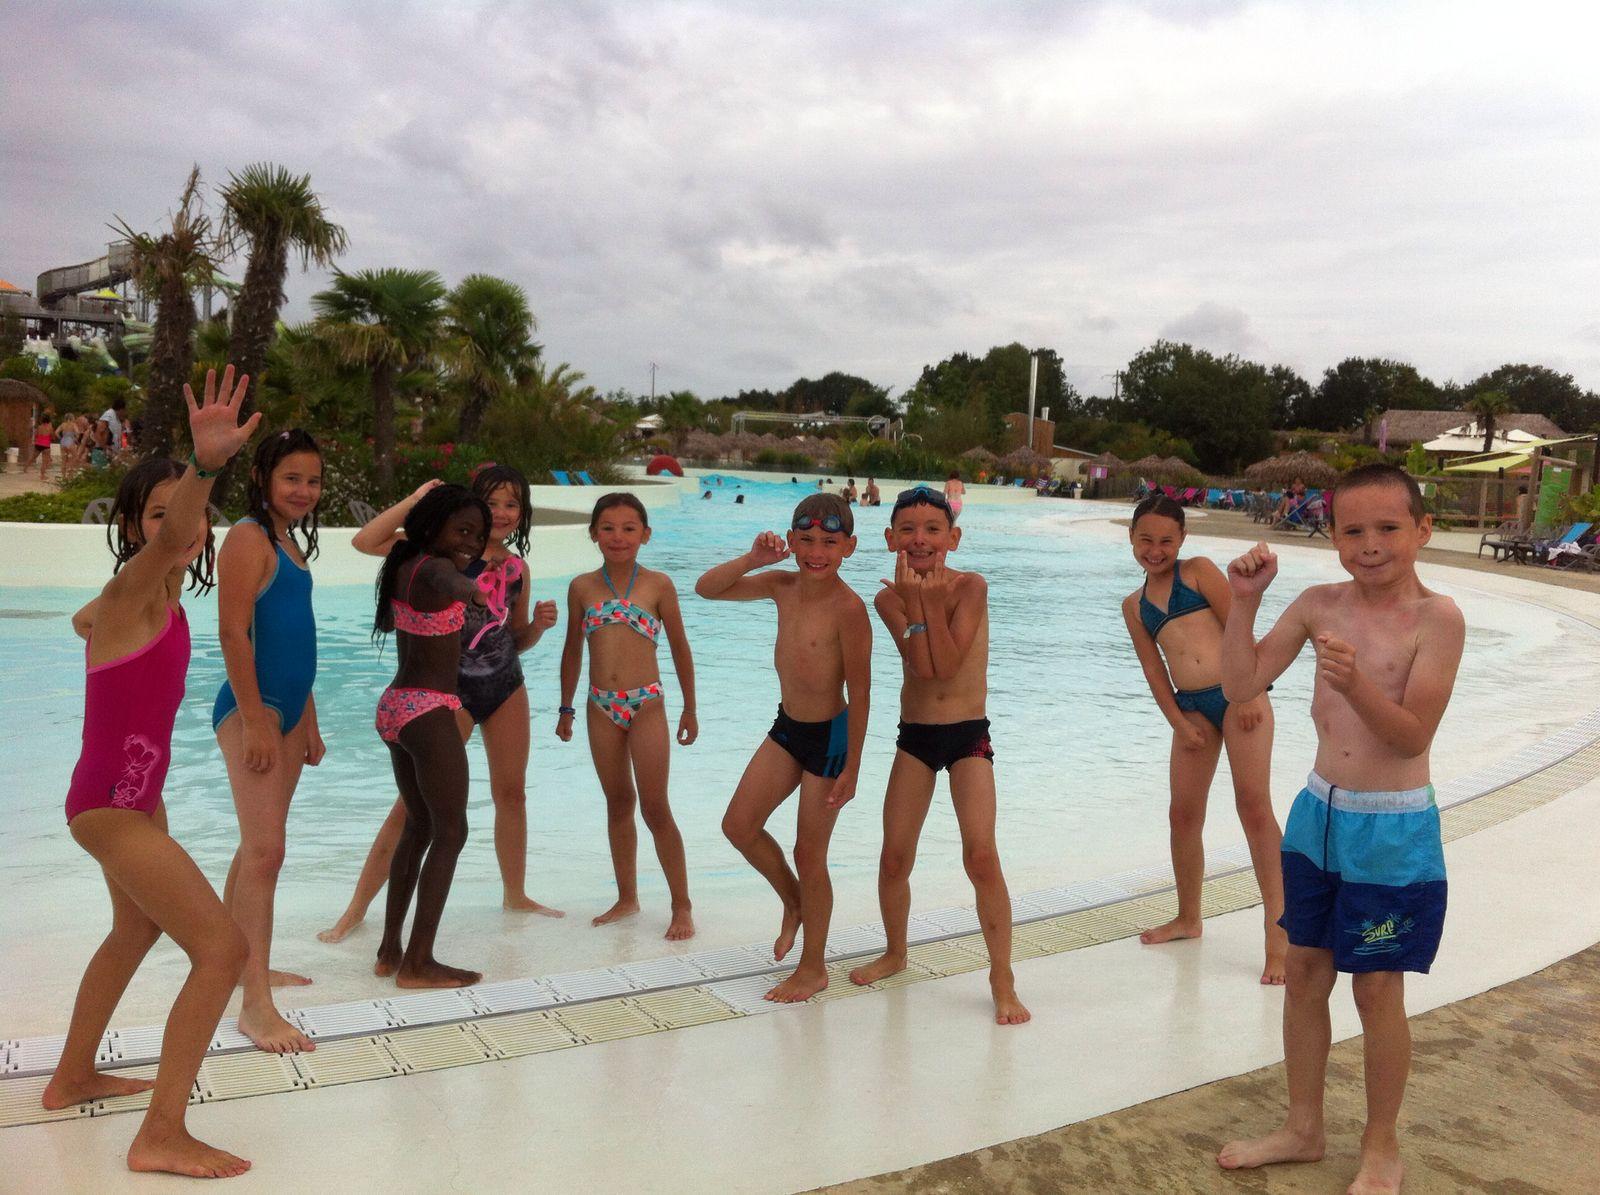 enfant au bord de la piscine en colonie de vacances